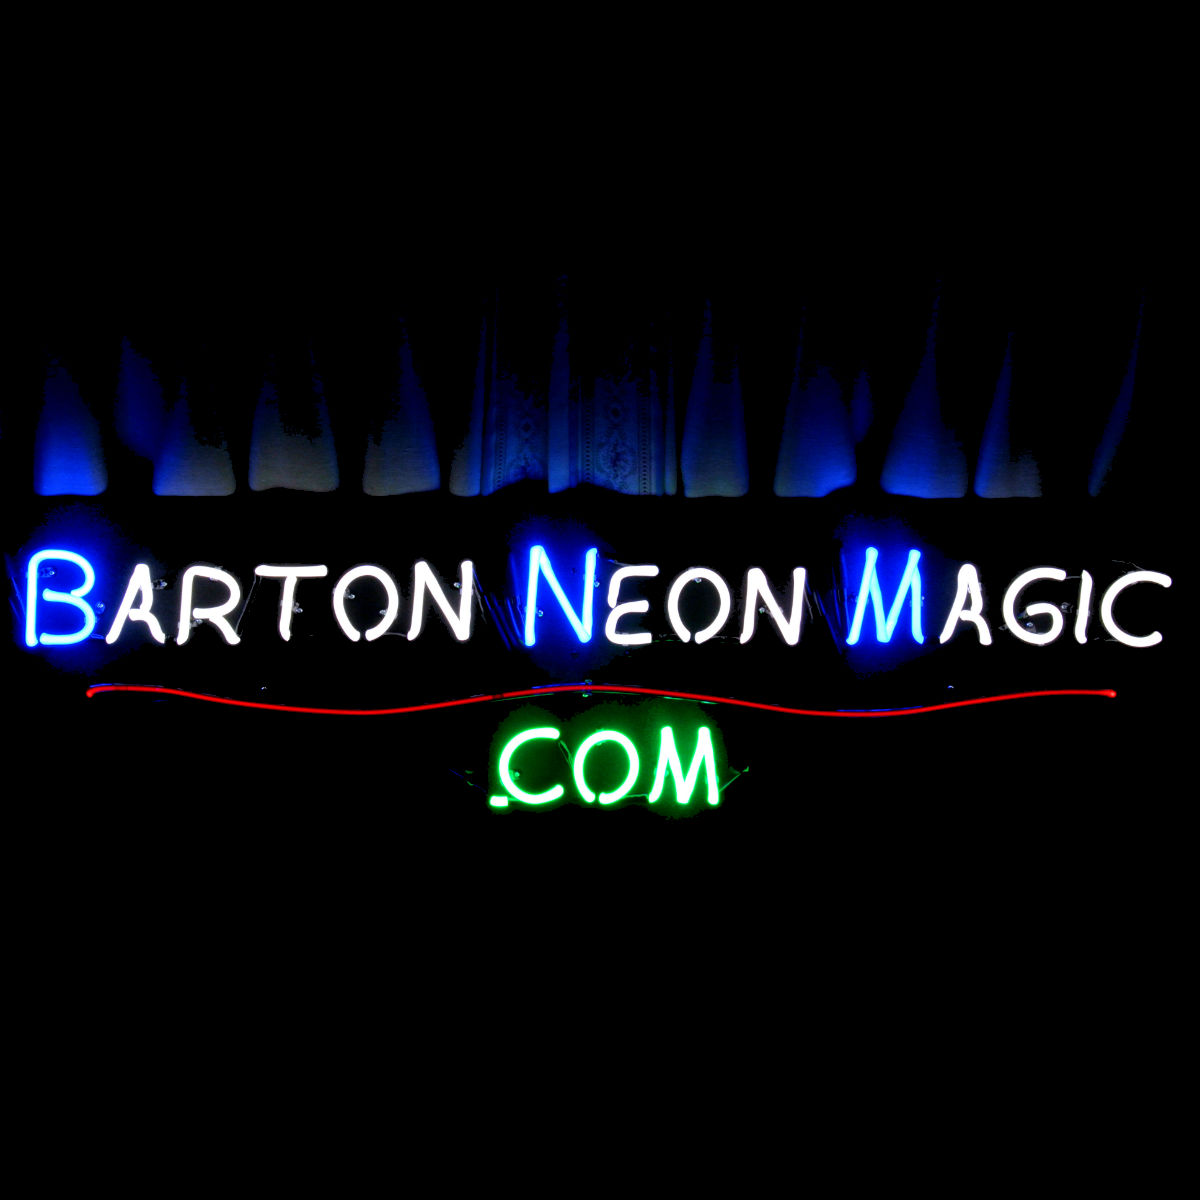 Unique Modern Neon Chandeliers by John Barton - BartonNeonMagic.com